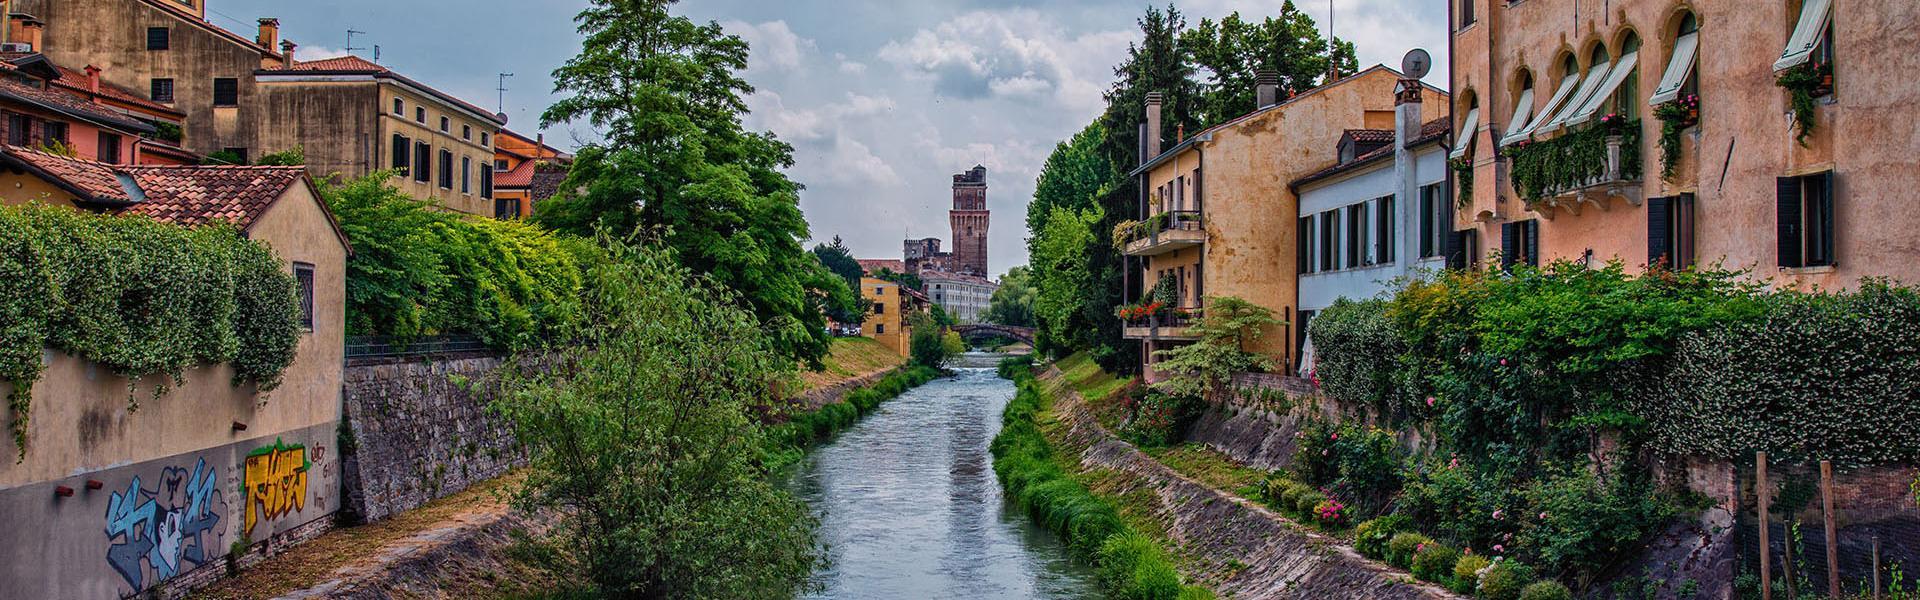 Padova Travel Vie d'acqua ©Studio Tomelleri